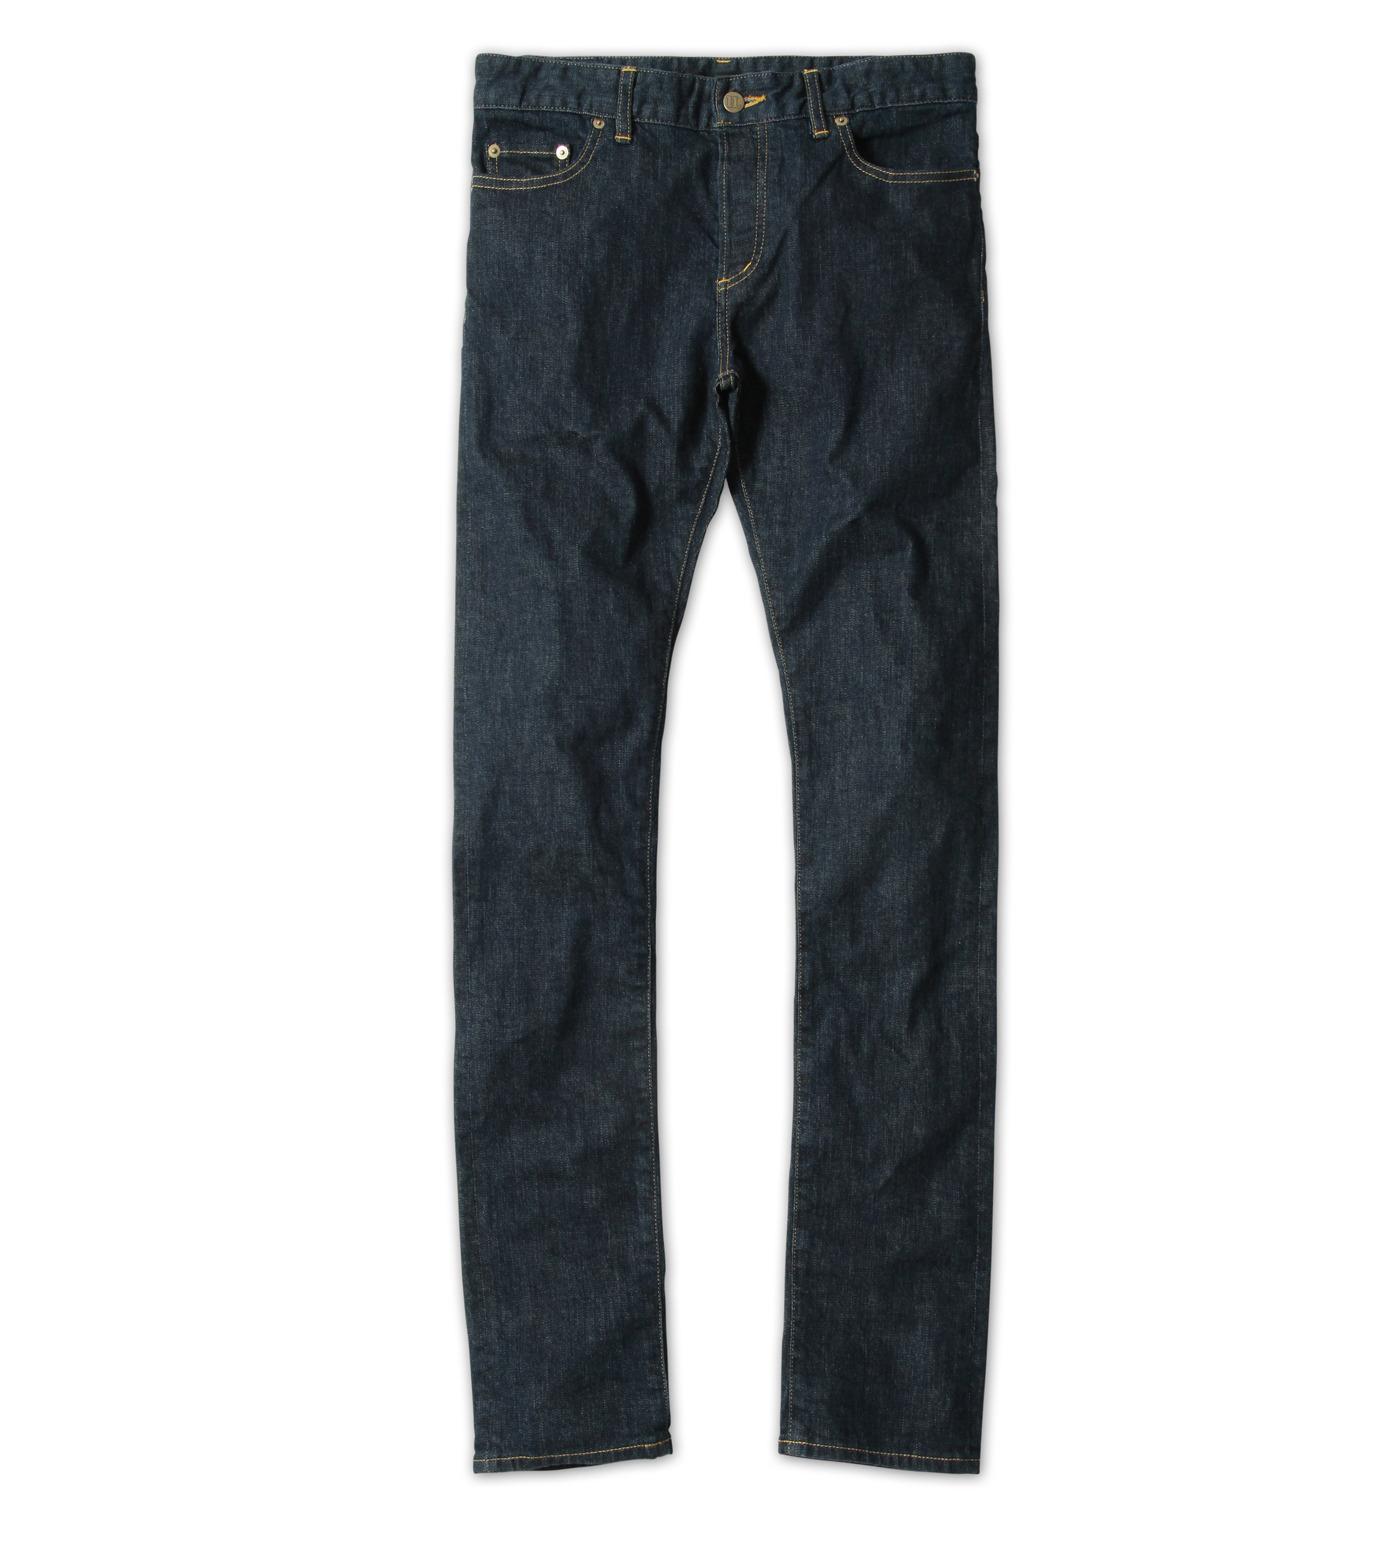 HL HEDDIE LOVU(エイチエル・エディールーヴ)のHL skinslim-INDIGO(パンツ/pants)-HL-skinslim-94 拡大詳細画像6